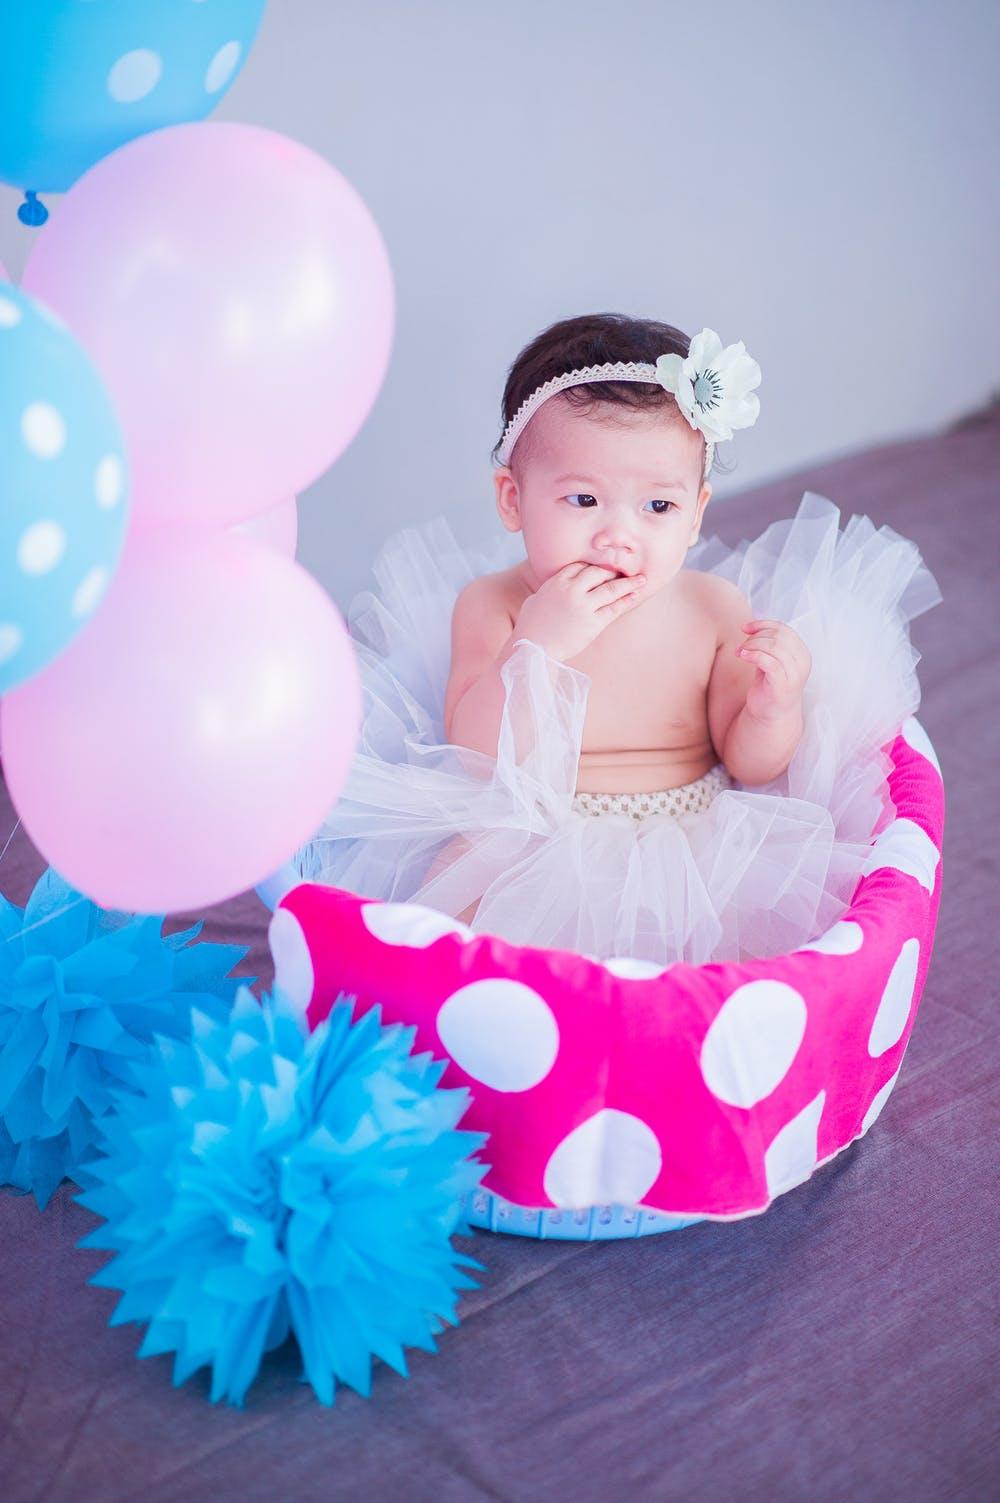 cute baby in a pink design baby hamper